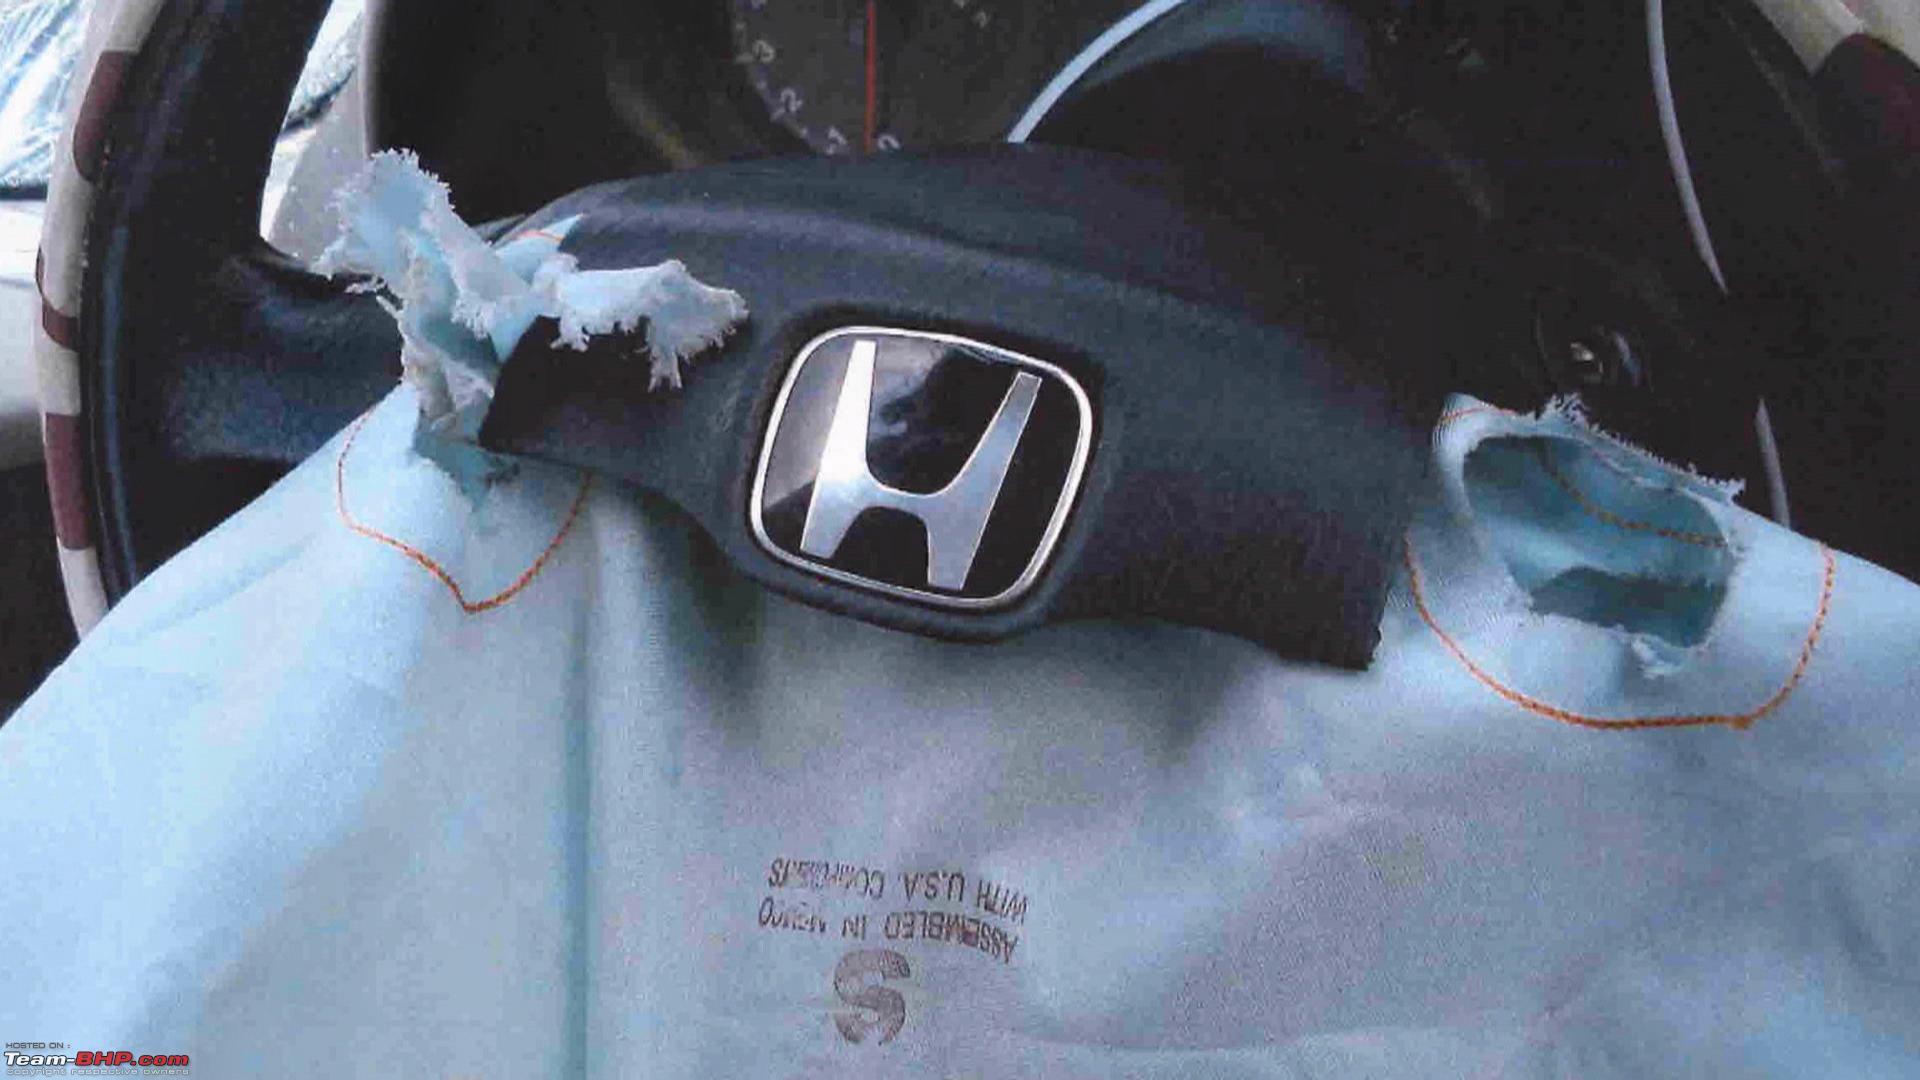 Honda Accord recalled over faulty Takata airbag inflators